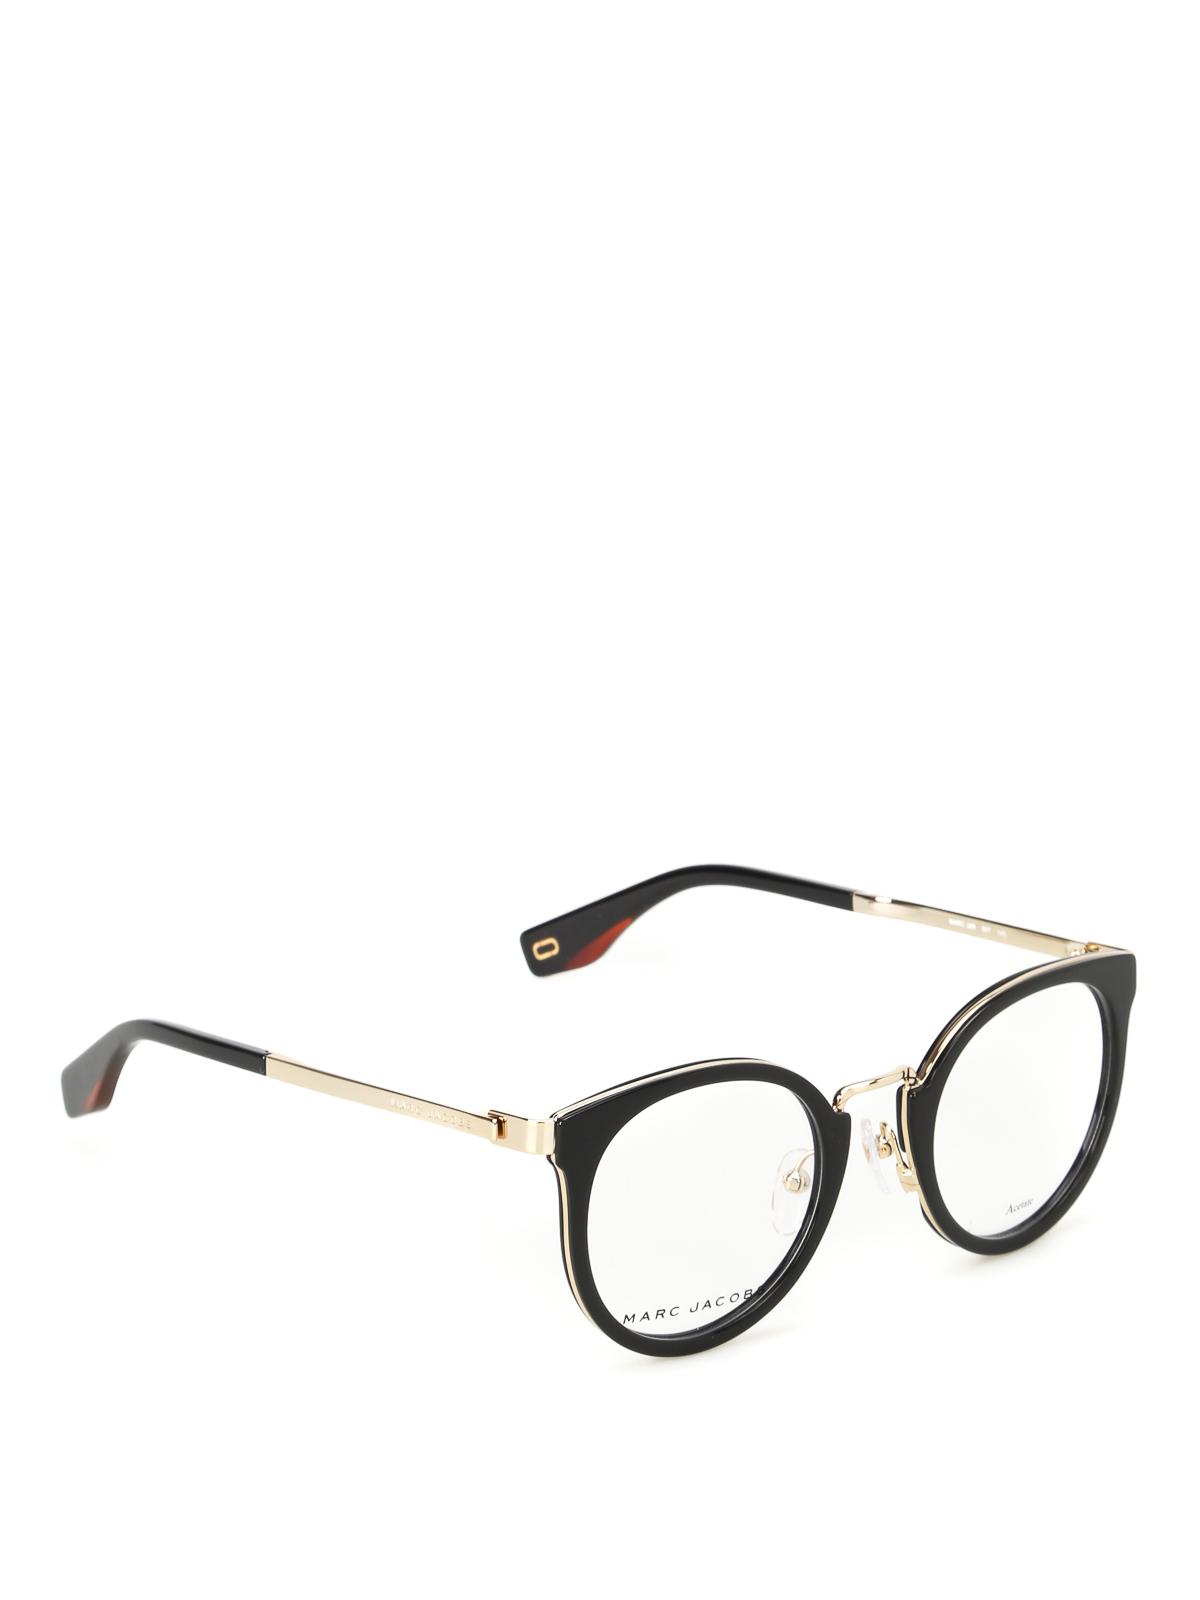 2fb3bd3e38aa Marc Jacobs - Gold-tone bridge rounded eyeglasses - sunglasses ...